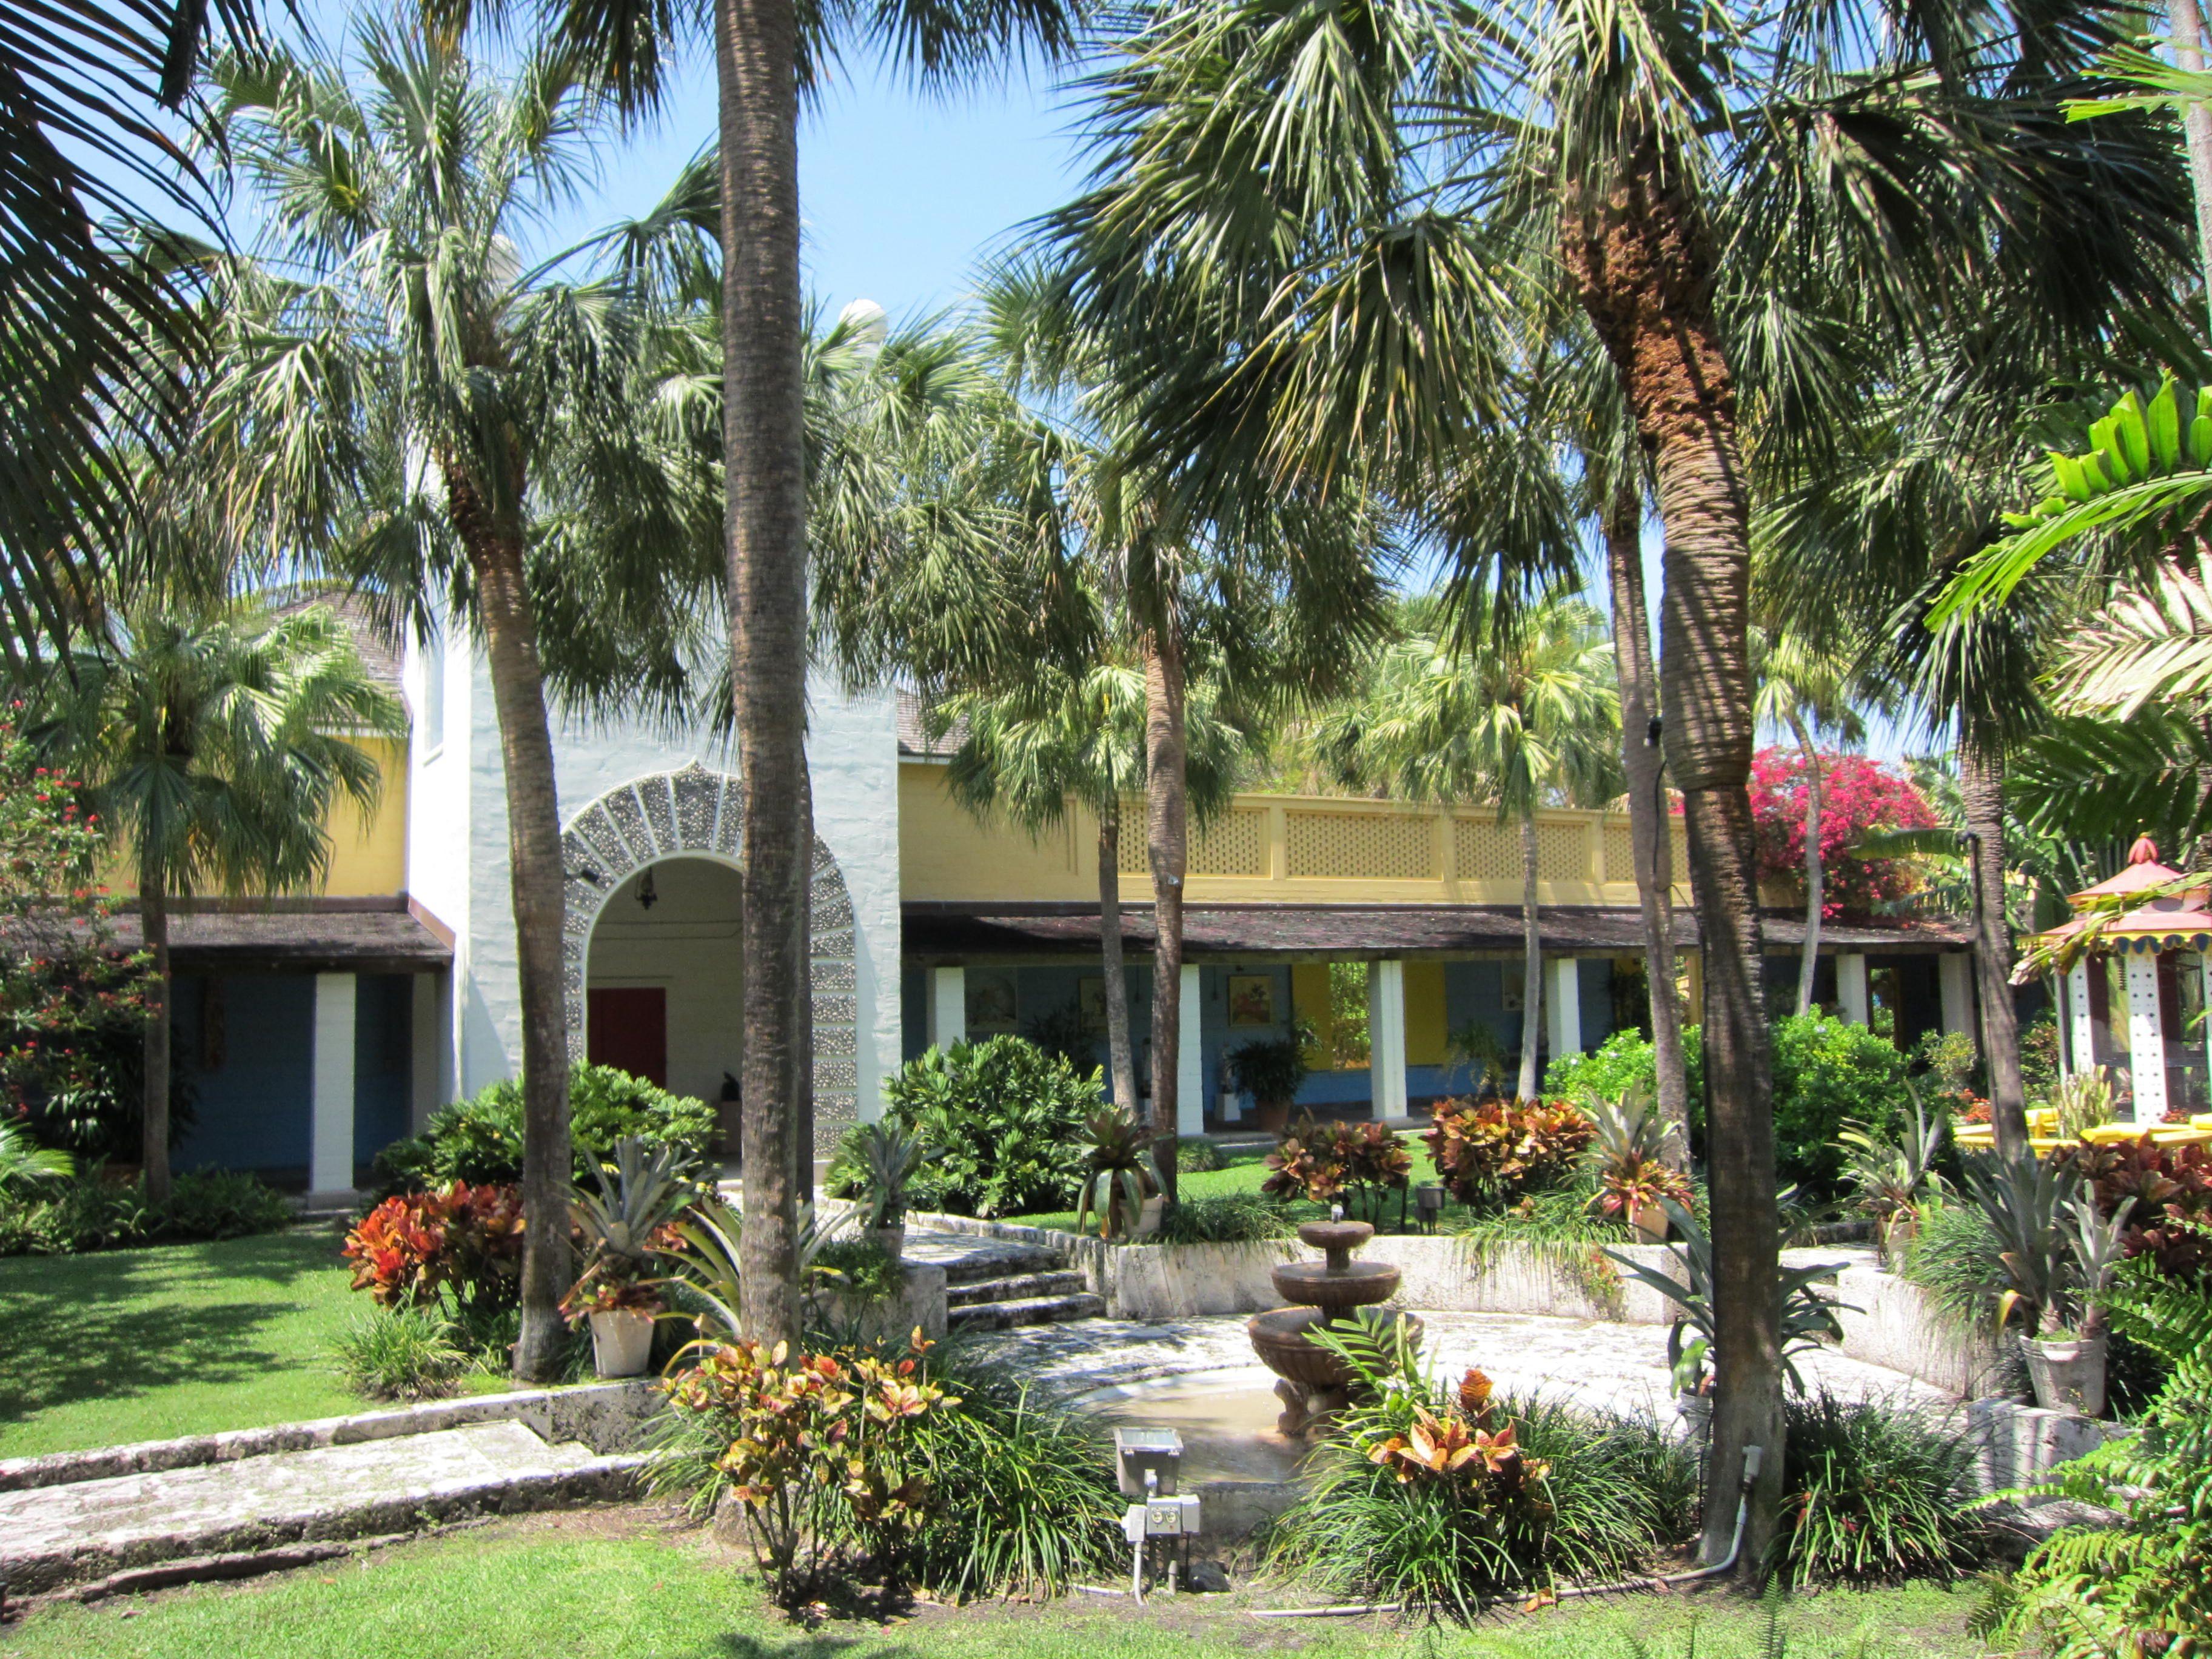 Why You Should Visit Bonnet House, Ft Lauderdale | Fort lauderdale ...